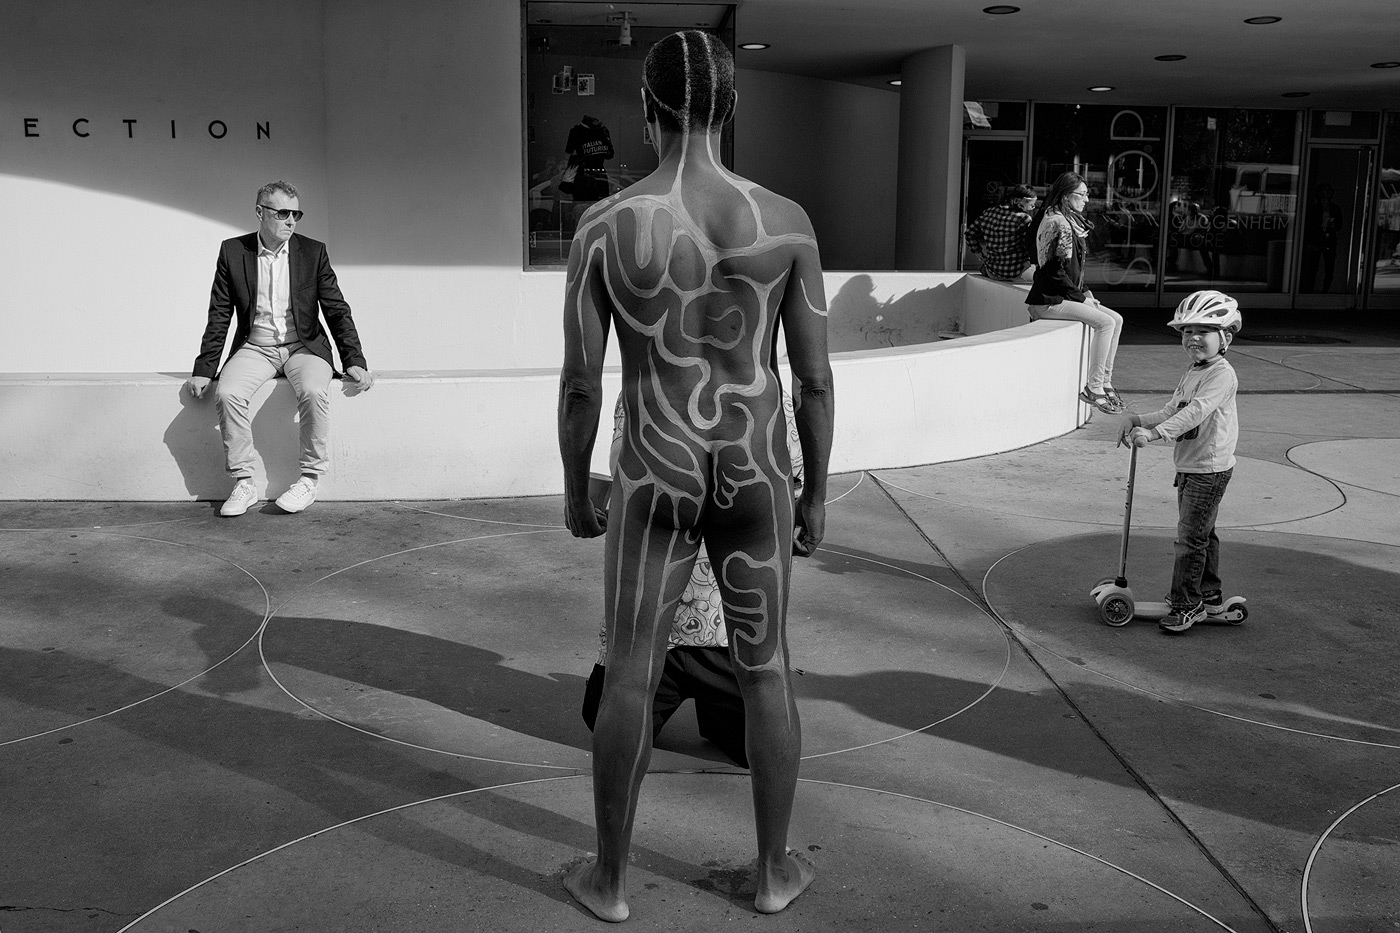 William-Bullard_USA_Pictures-at-an-Exhibition_08.jpeg